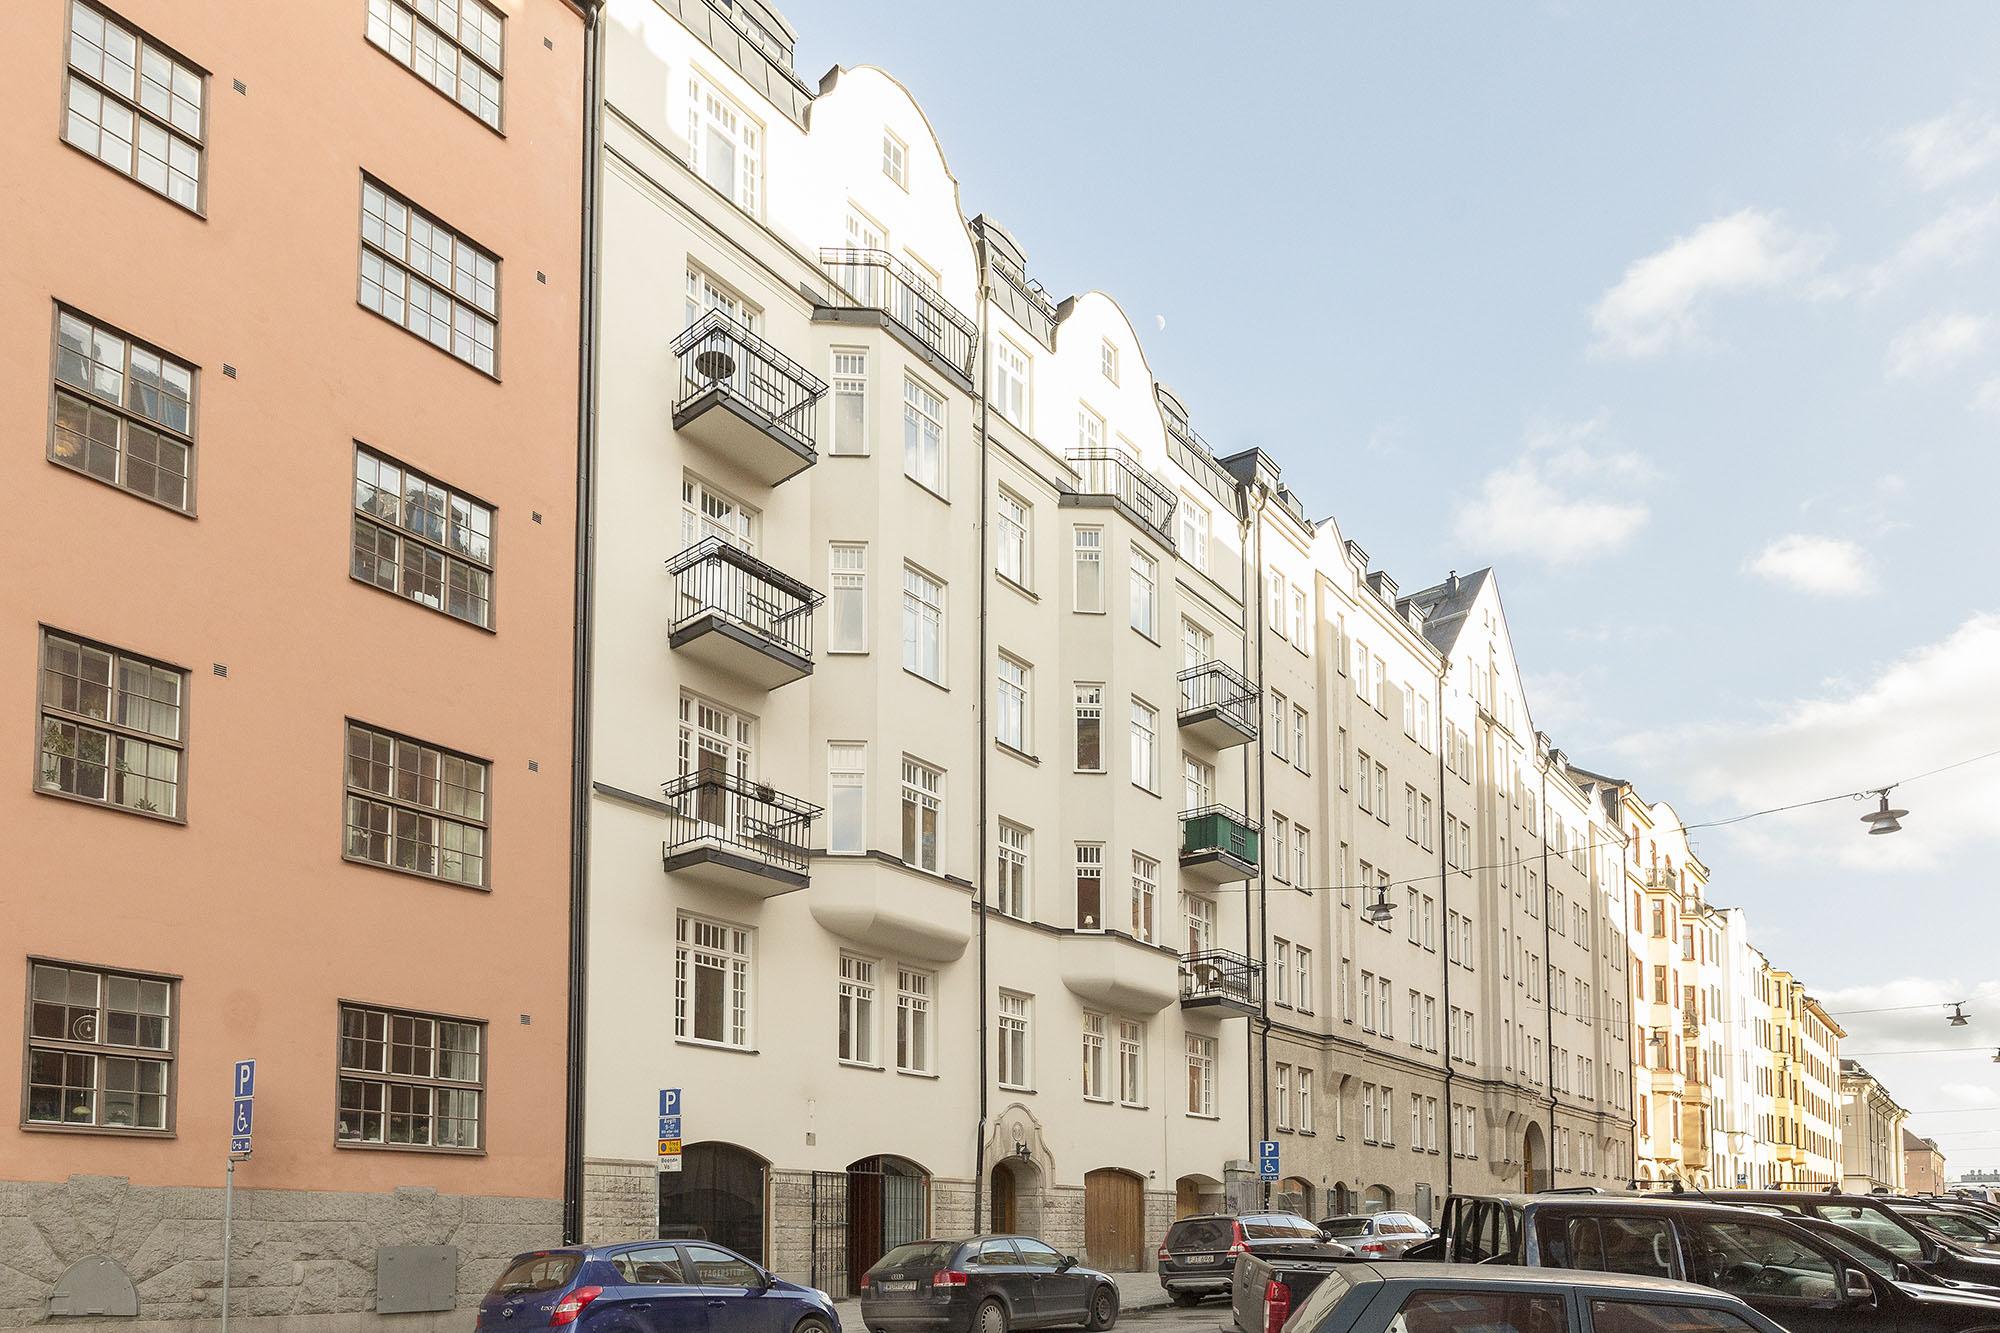 Vasastan Stockholm Apartment